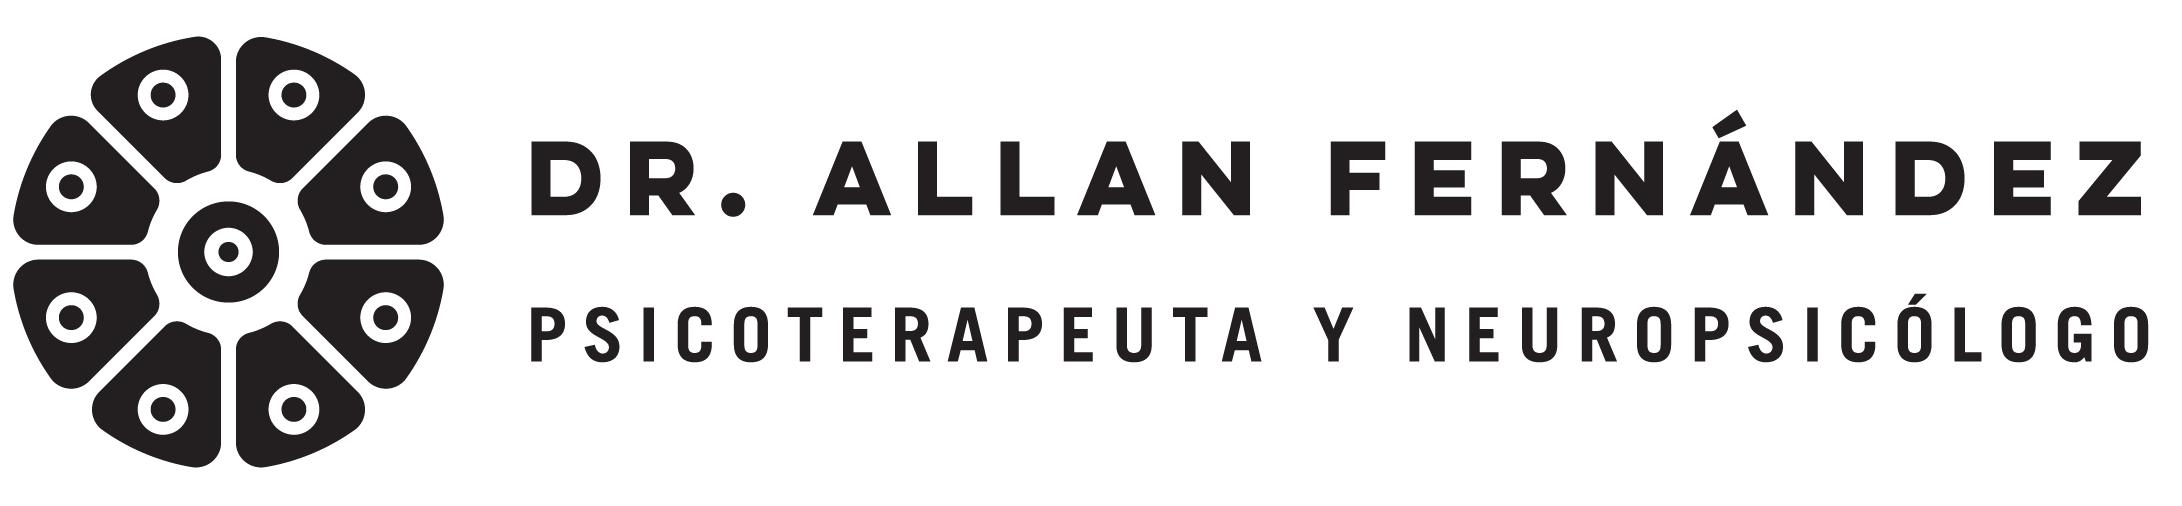 Dr. Allan Fernández